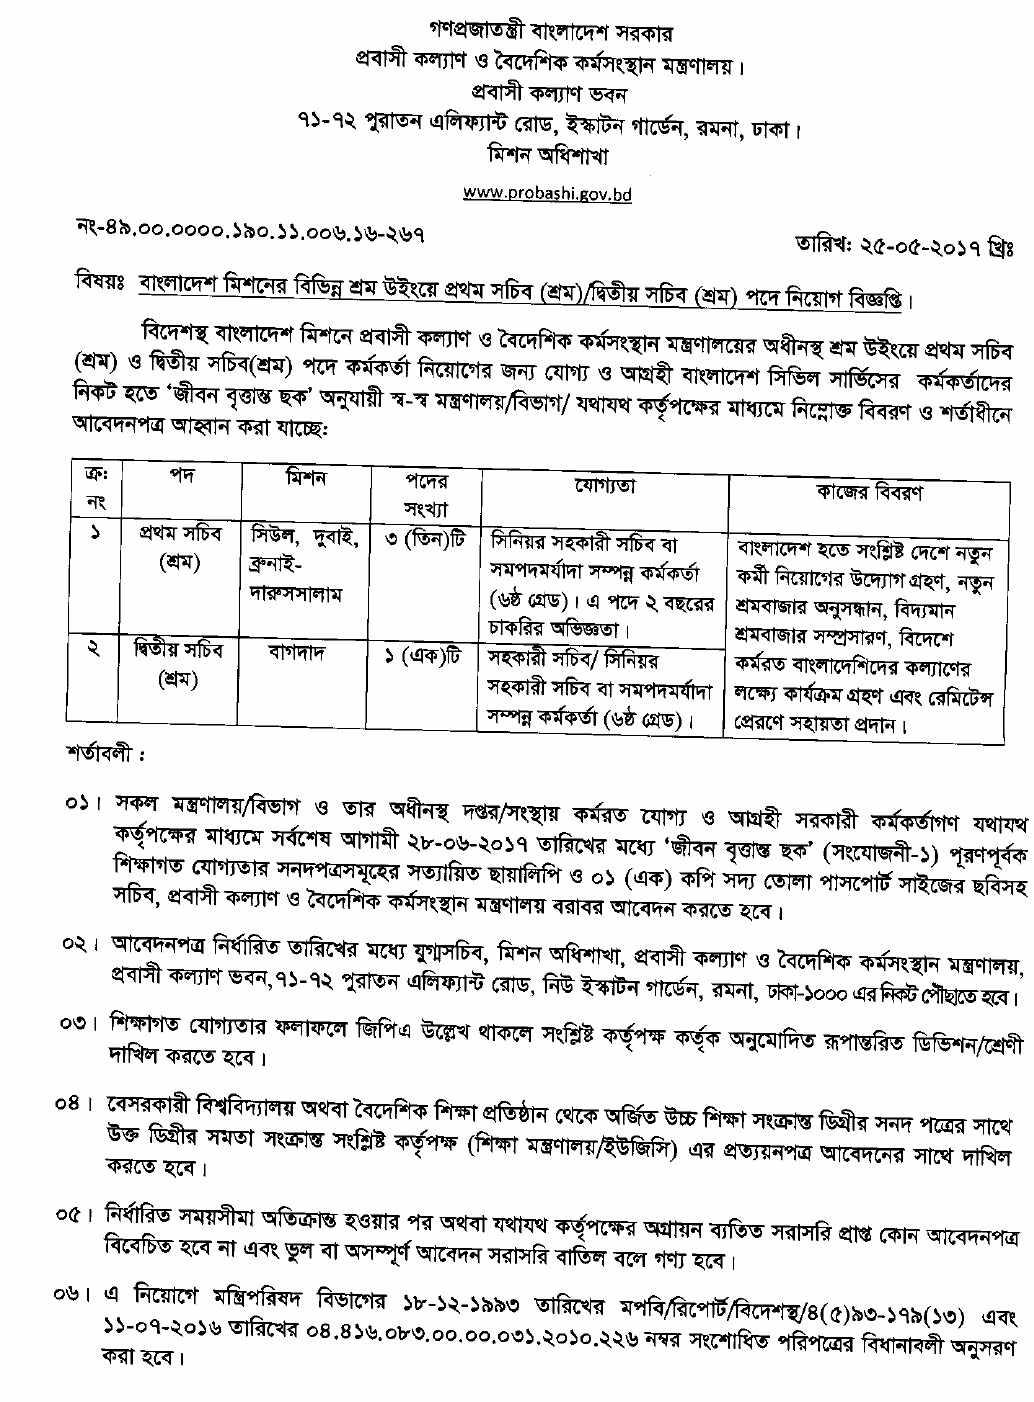 Ministry of Expatriates Welfare and Overseas Job Circular 2017